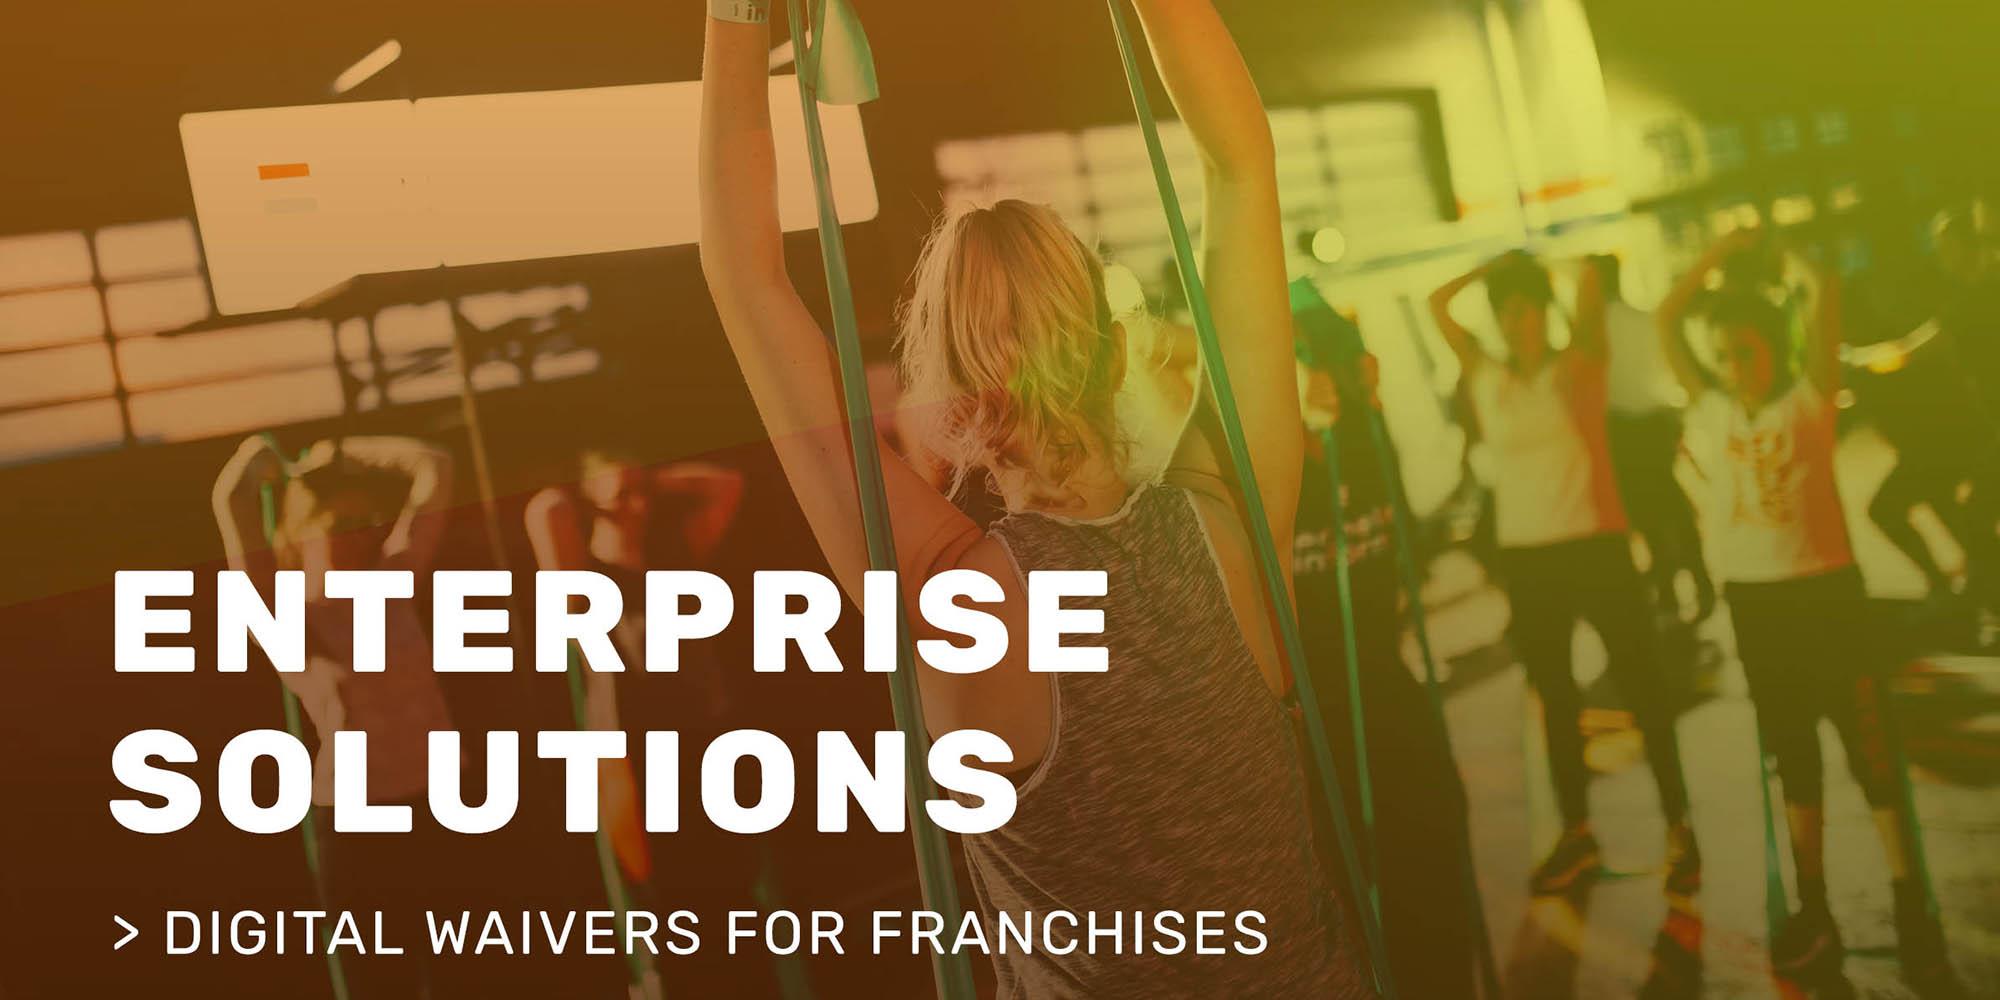 Digital Waivers For Franchises